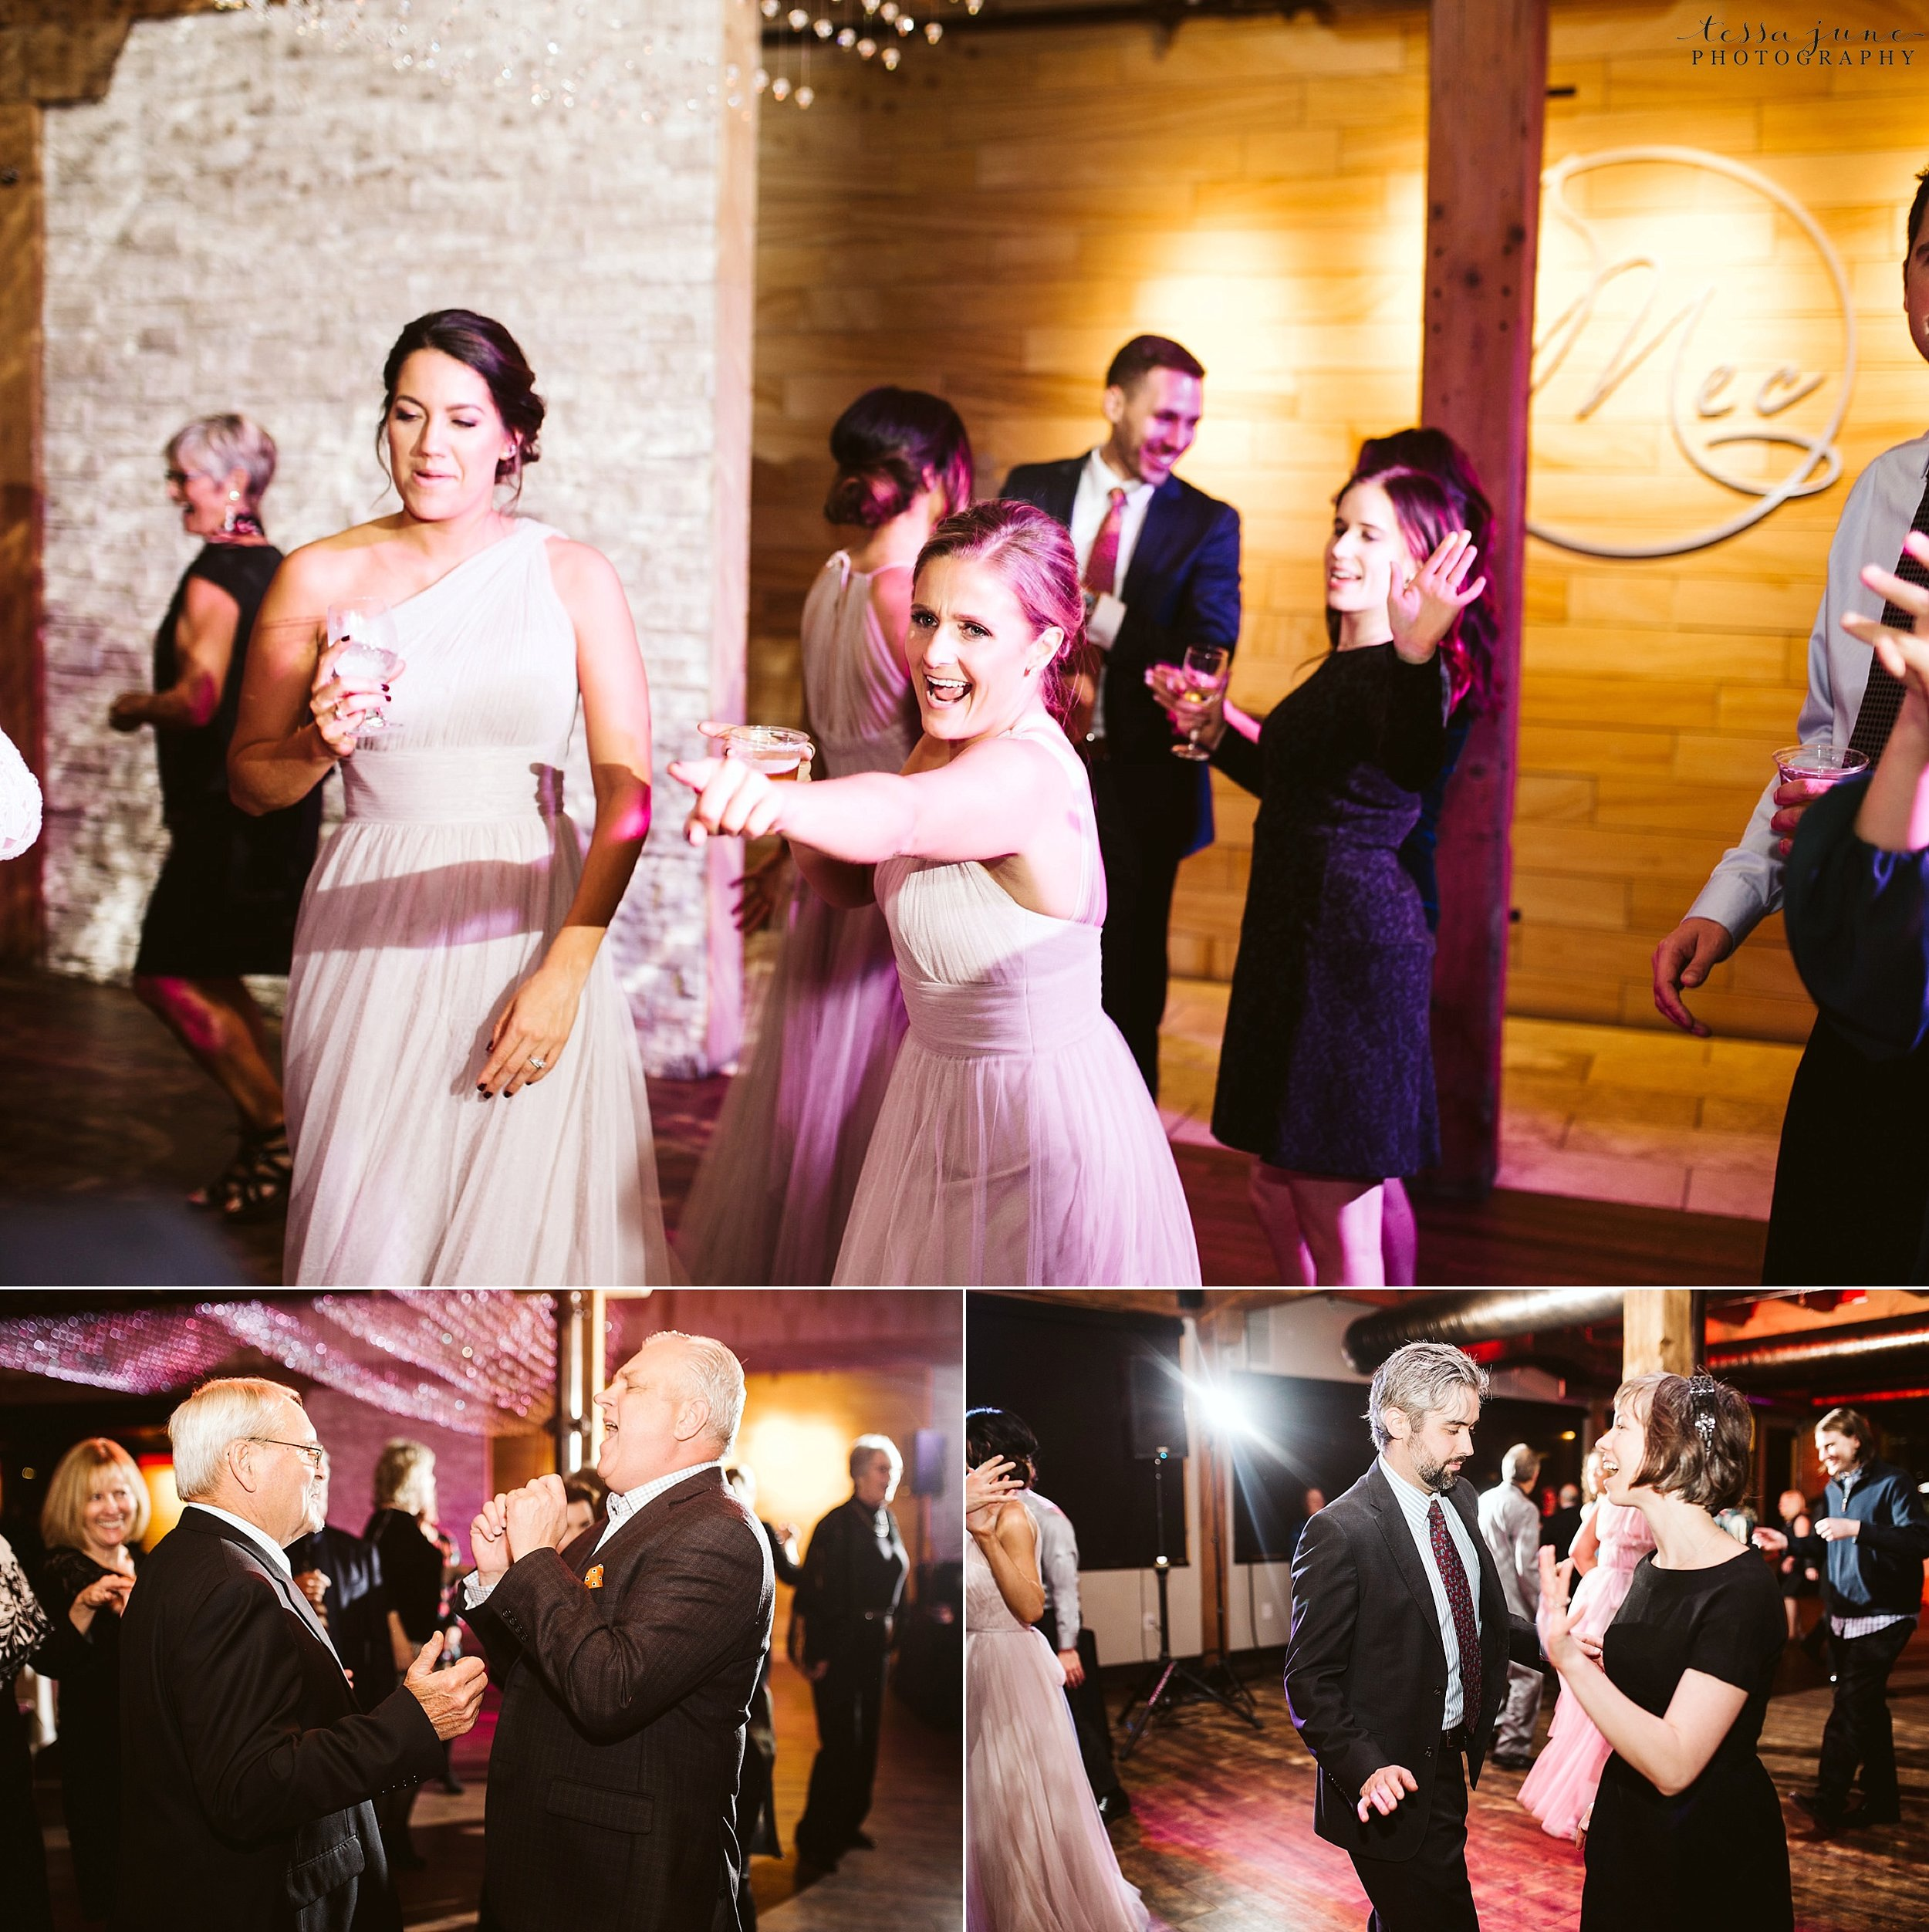 minneapolis-event-center-winter-romantic-snow-wedding-december-227.jpg